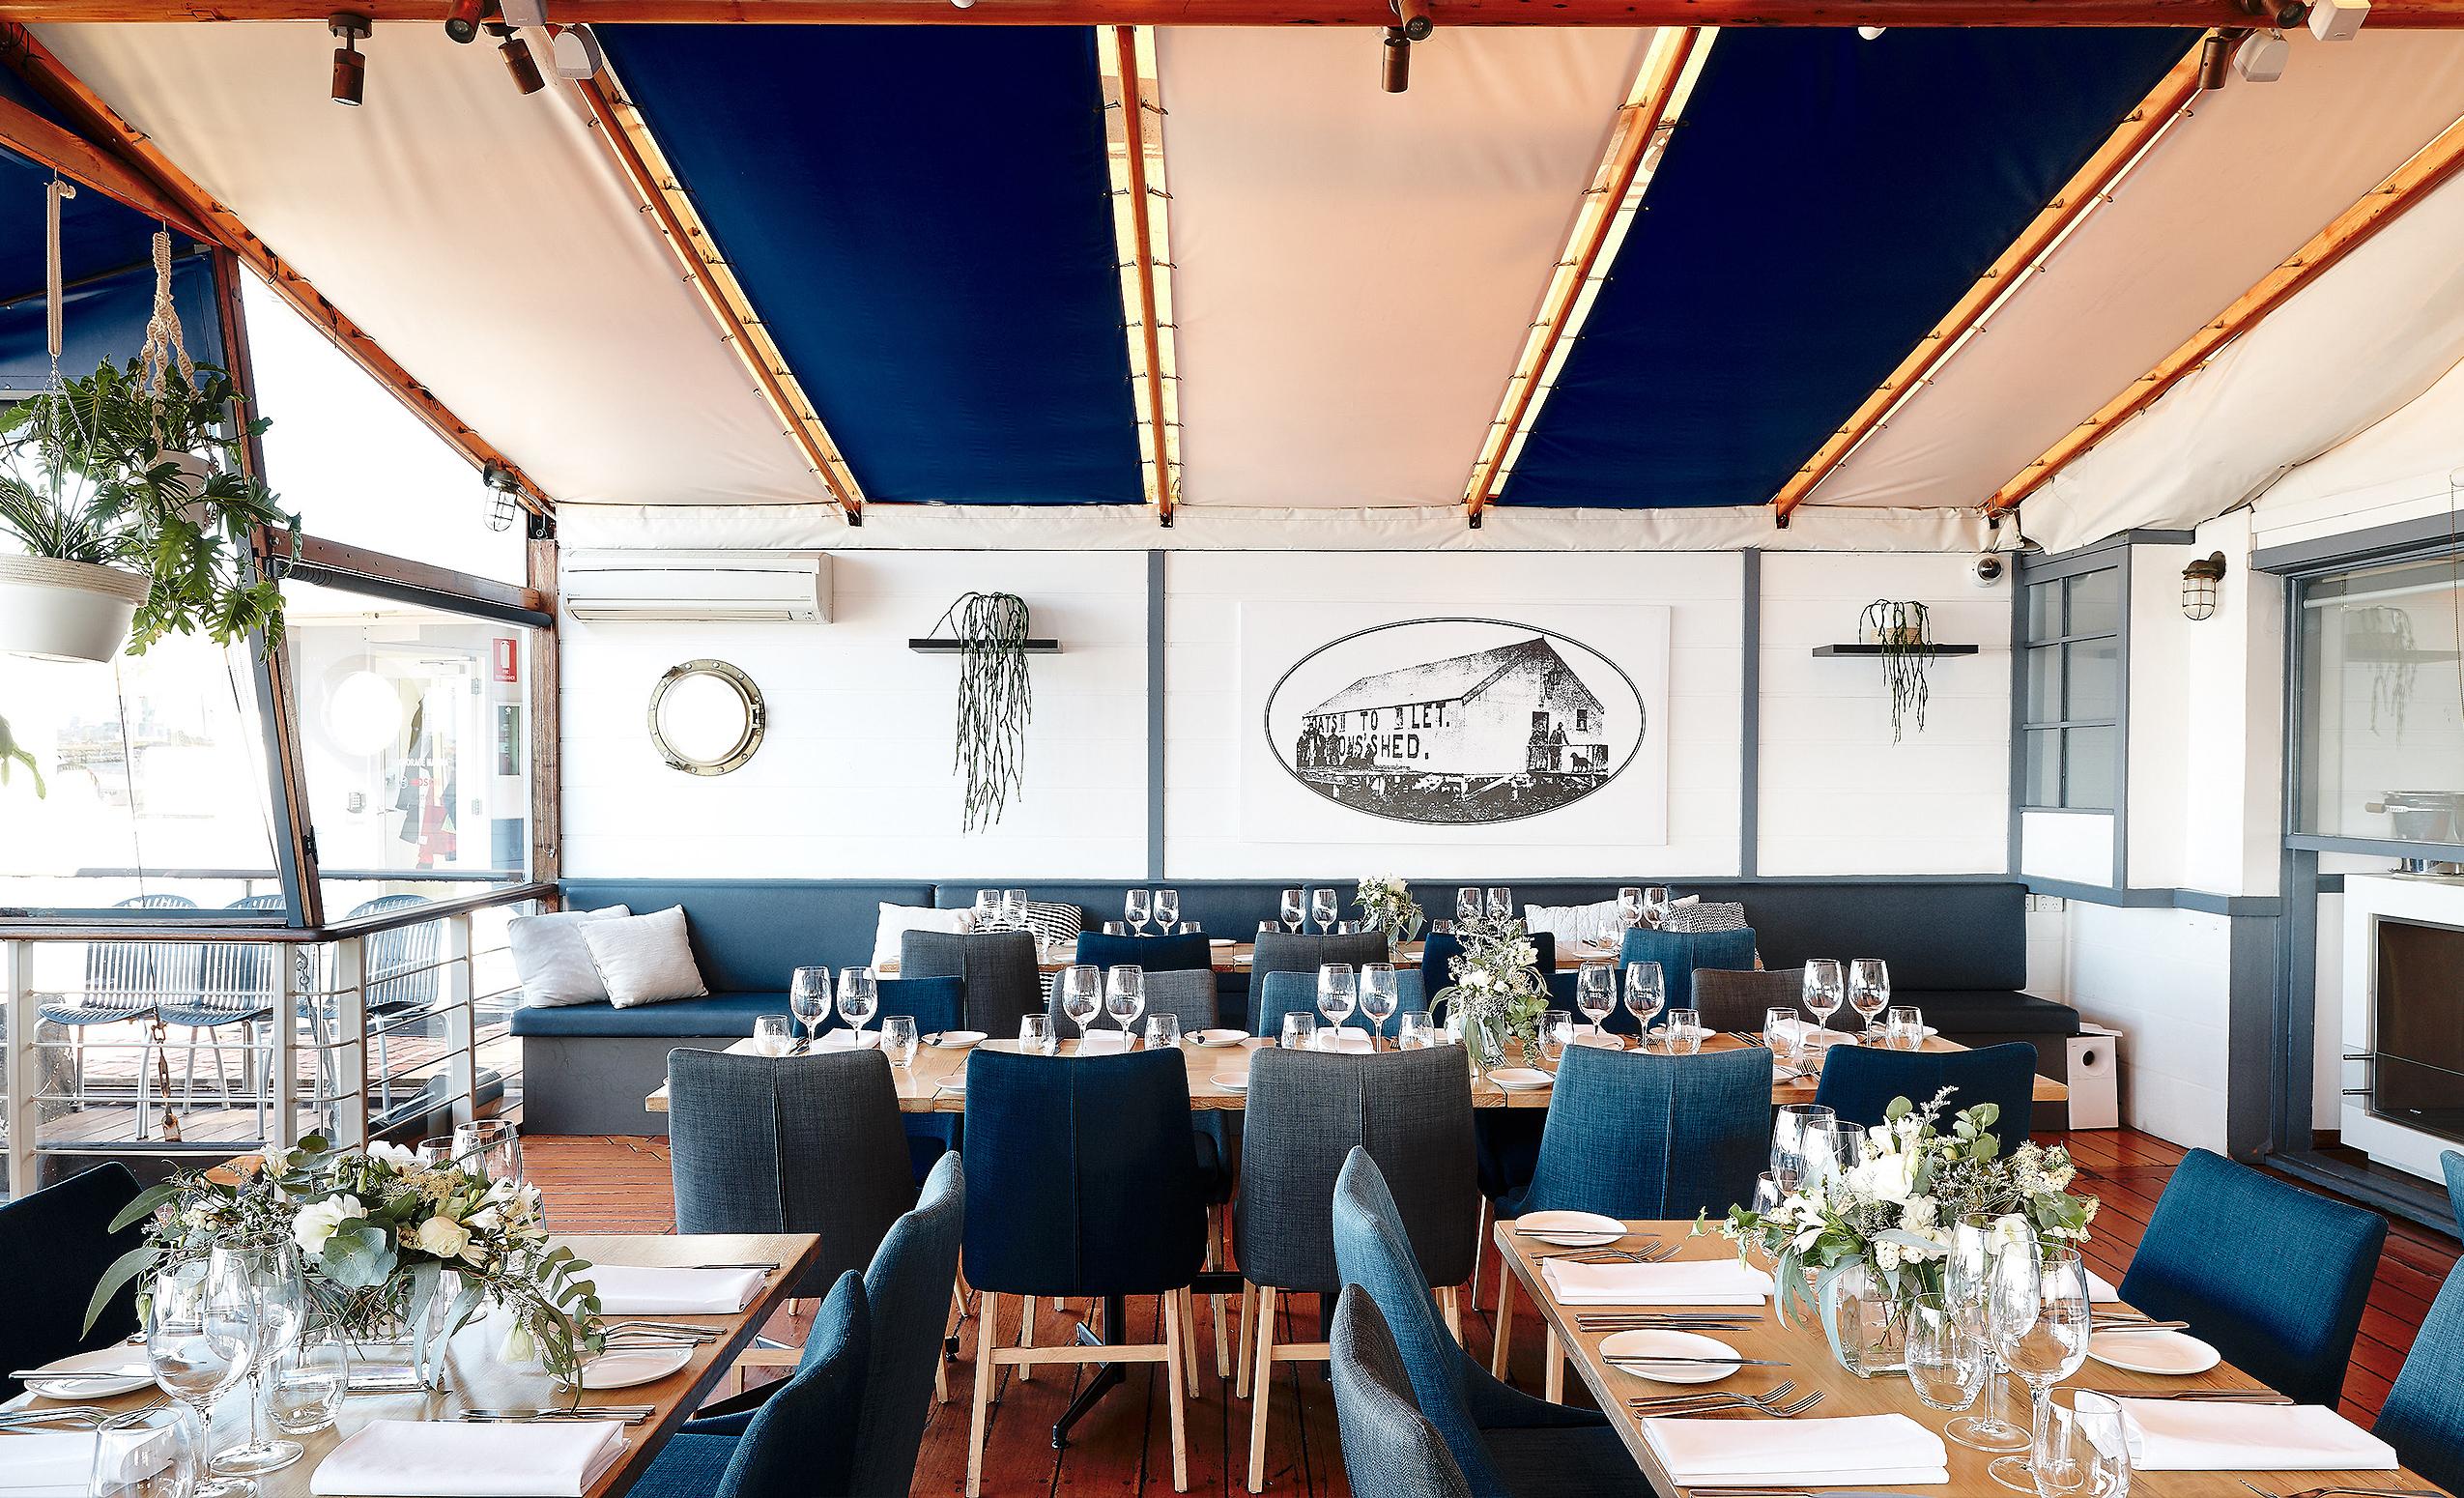 melbourne private dining rooms | Restaurant Private Dining Rooms Melbourne | Small Function ...